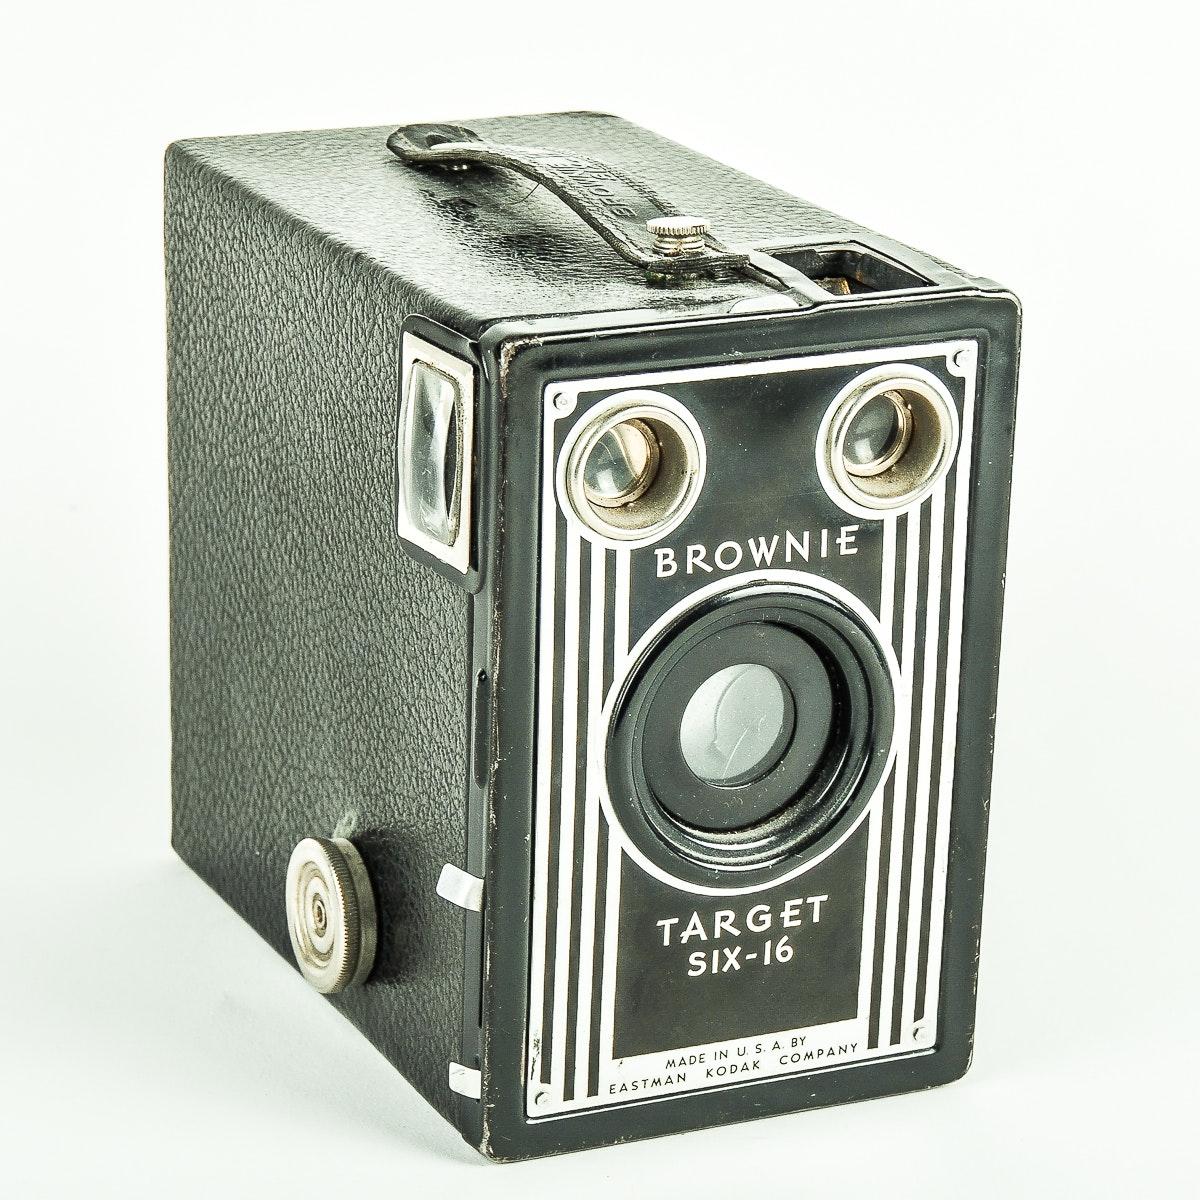 Circa 1940s Eastman Kodak Company Brownie Target Six-16 Camera